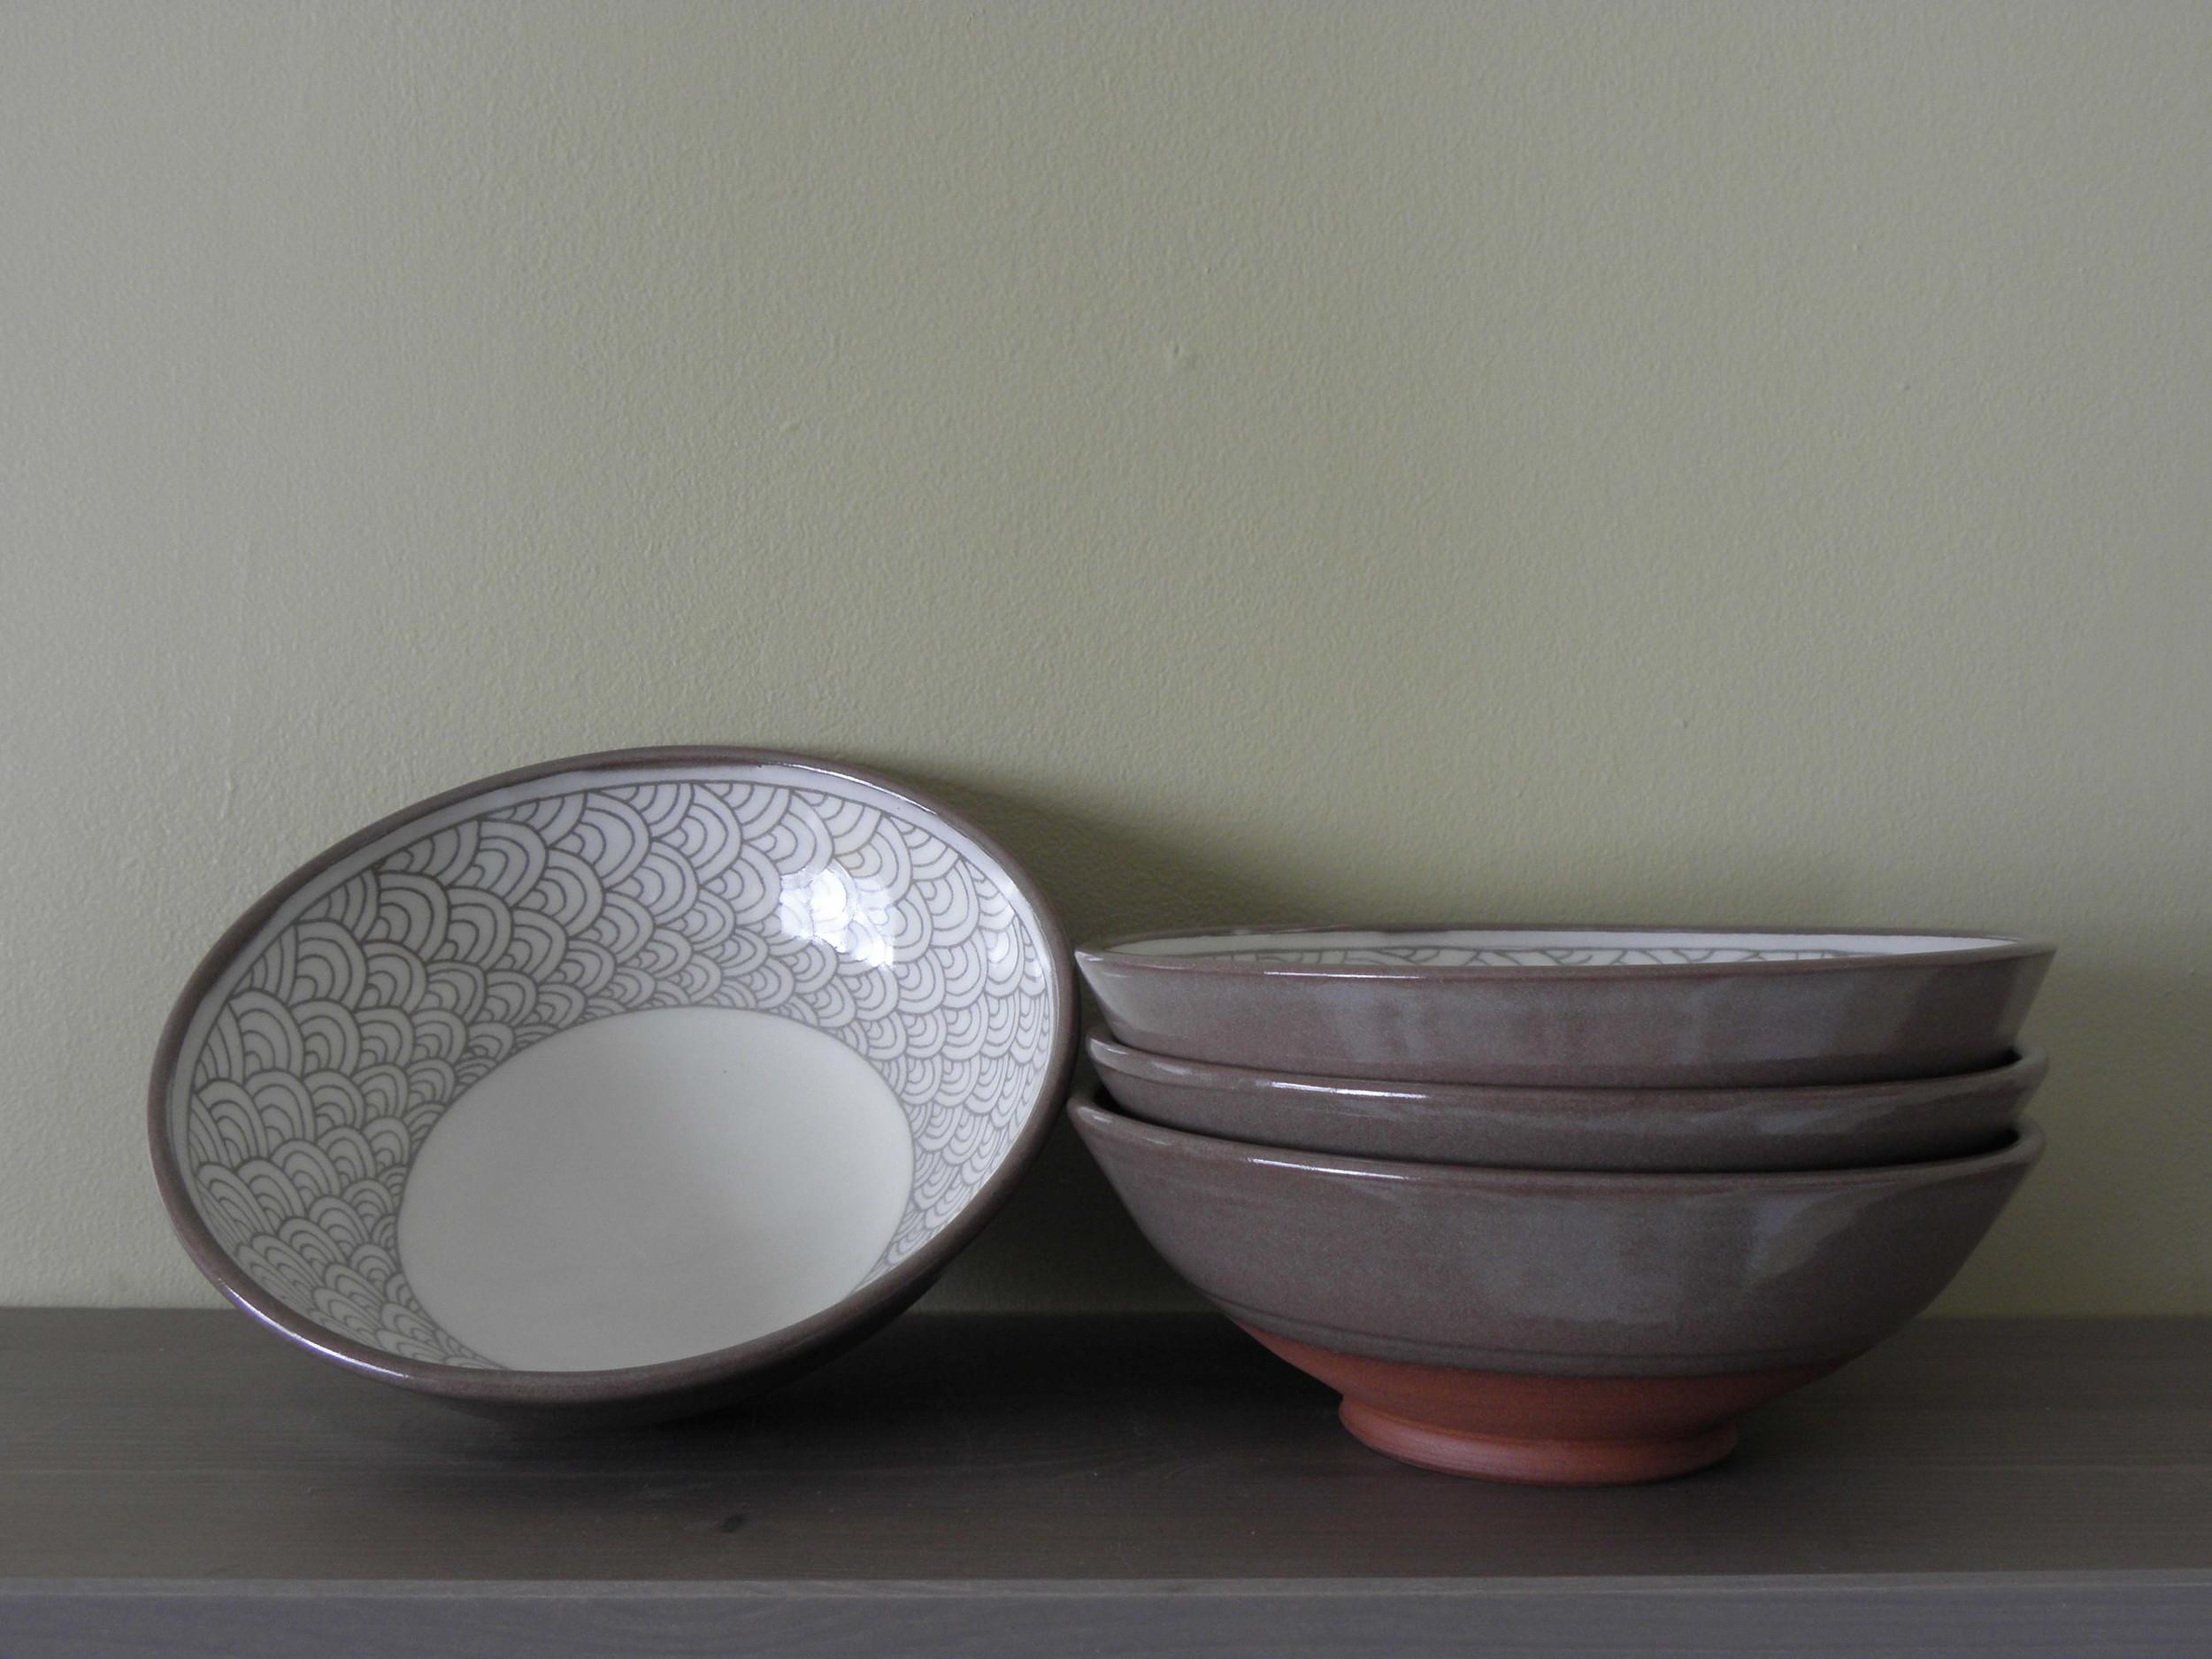 Pattern Banding Bowls, indoors